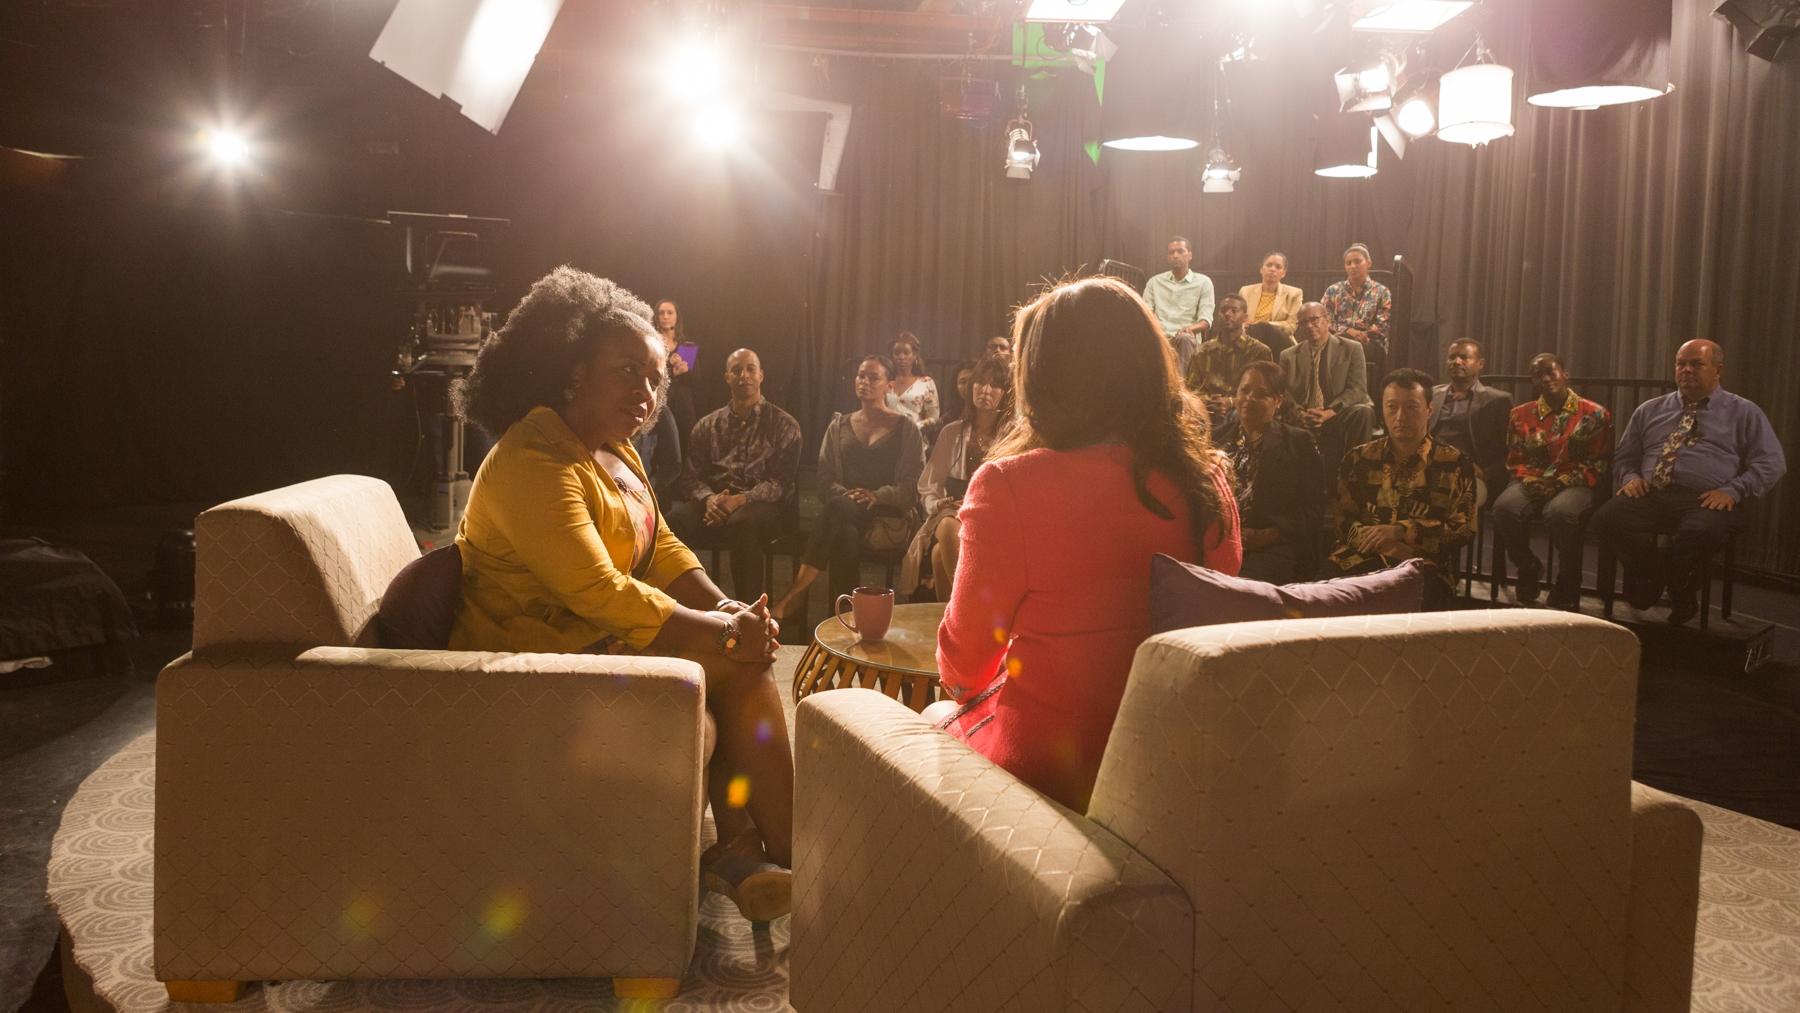 Talk show host Sally Rae (Vanessa Williams) blindsides Virginia (Uzo Aduba) during an interview.